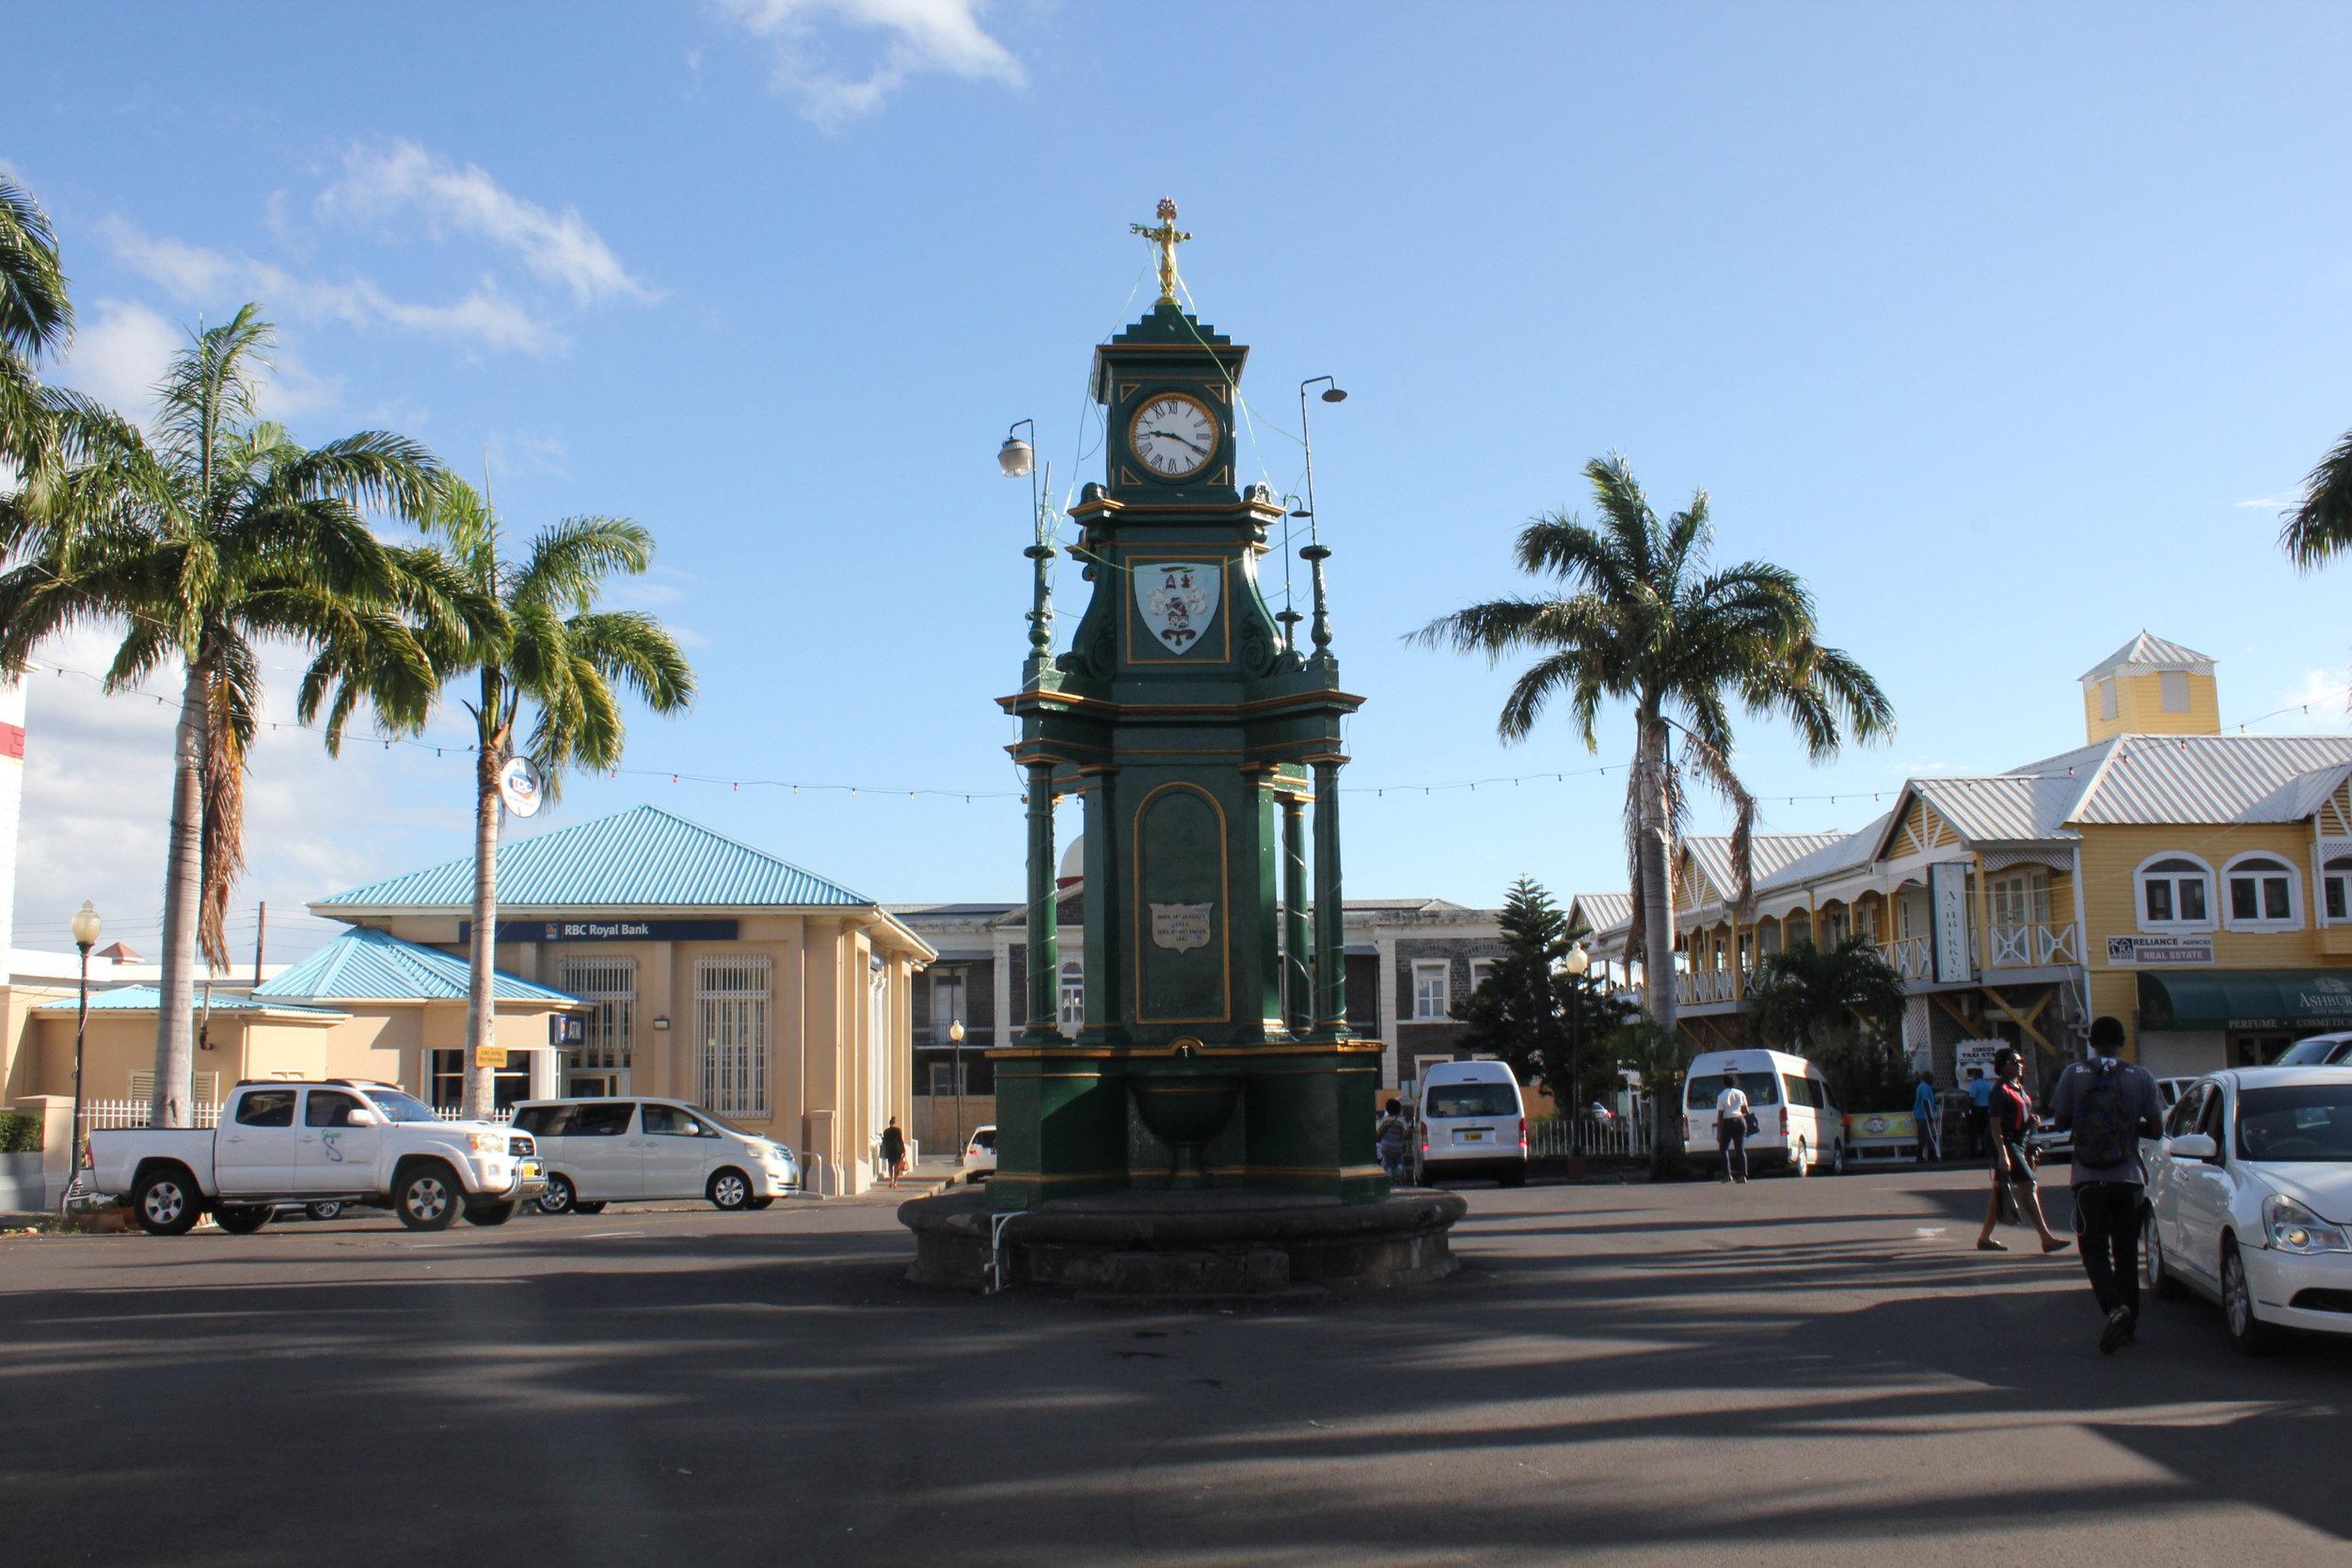 Downtown Basseterre – Clock tower